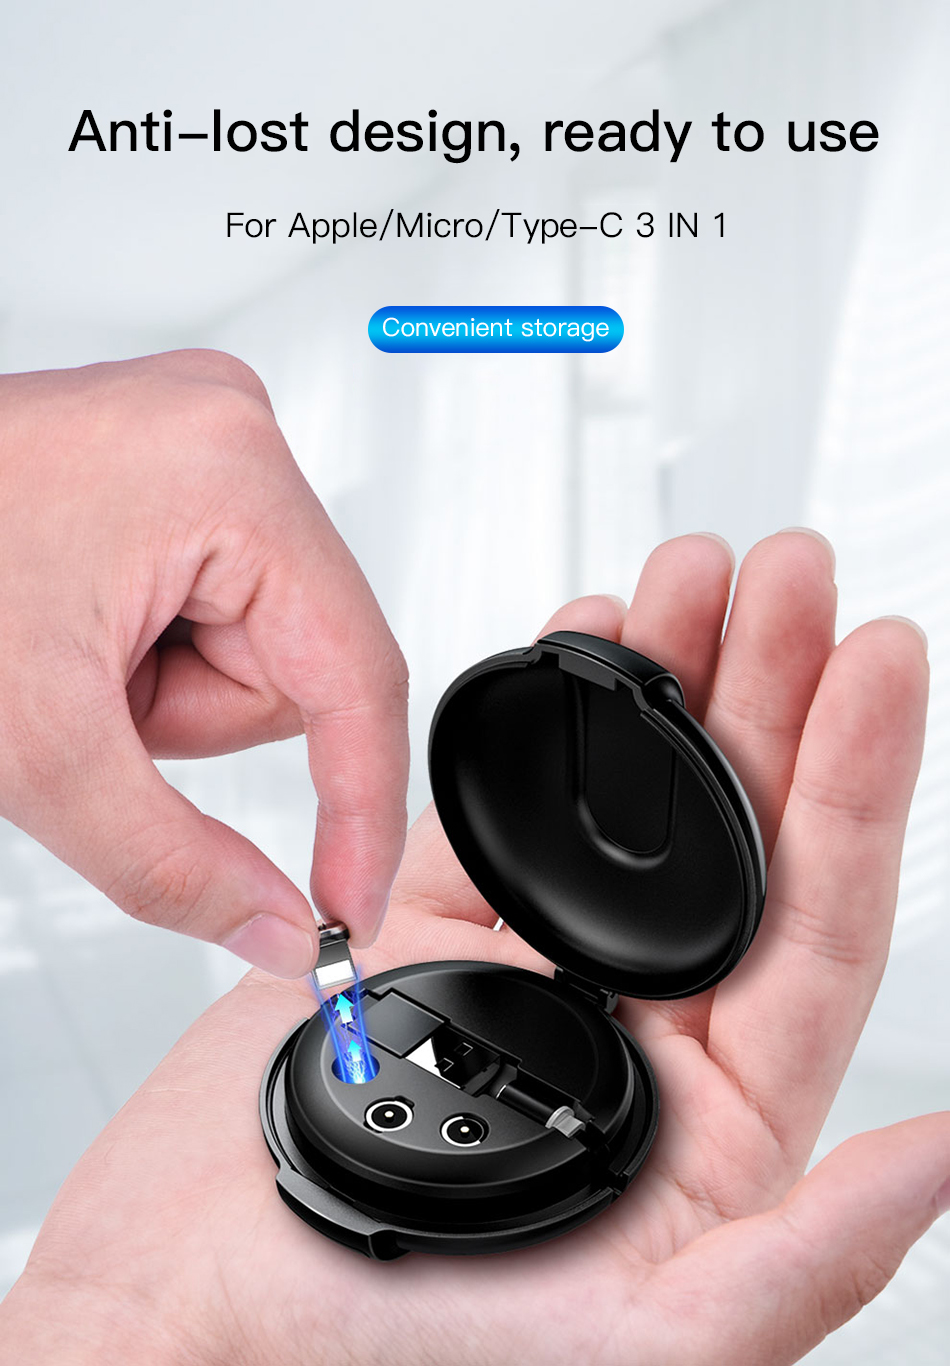 ACCEZZ 3合1磁性电缆,带整理盒,适用于iPhone XS XR 11 Pro Max Micro Micro USB Type C磁铁充电器电缆(5)